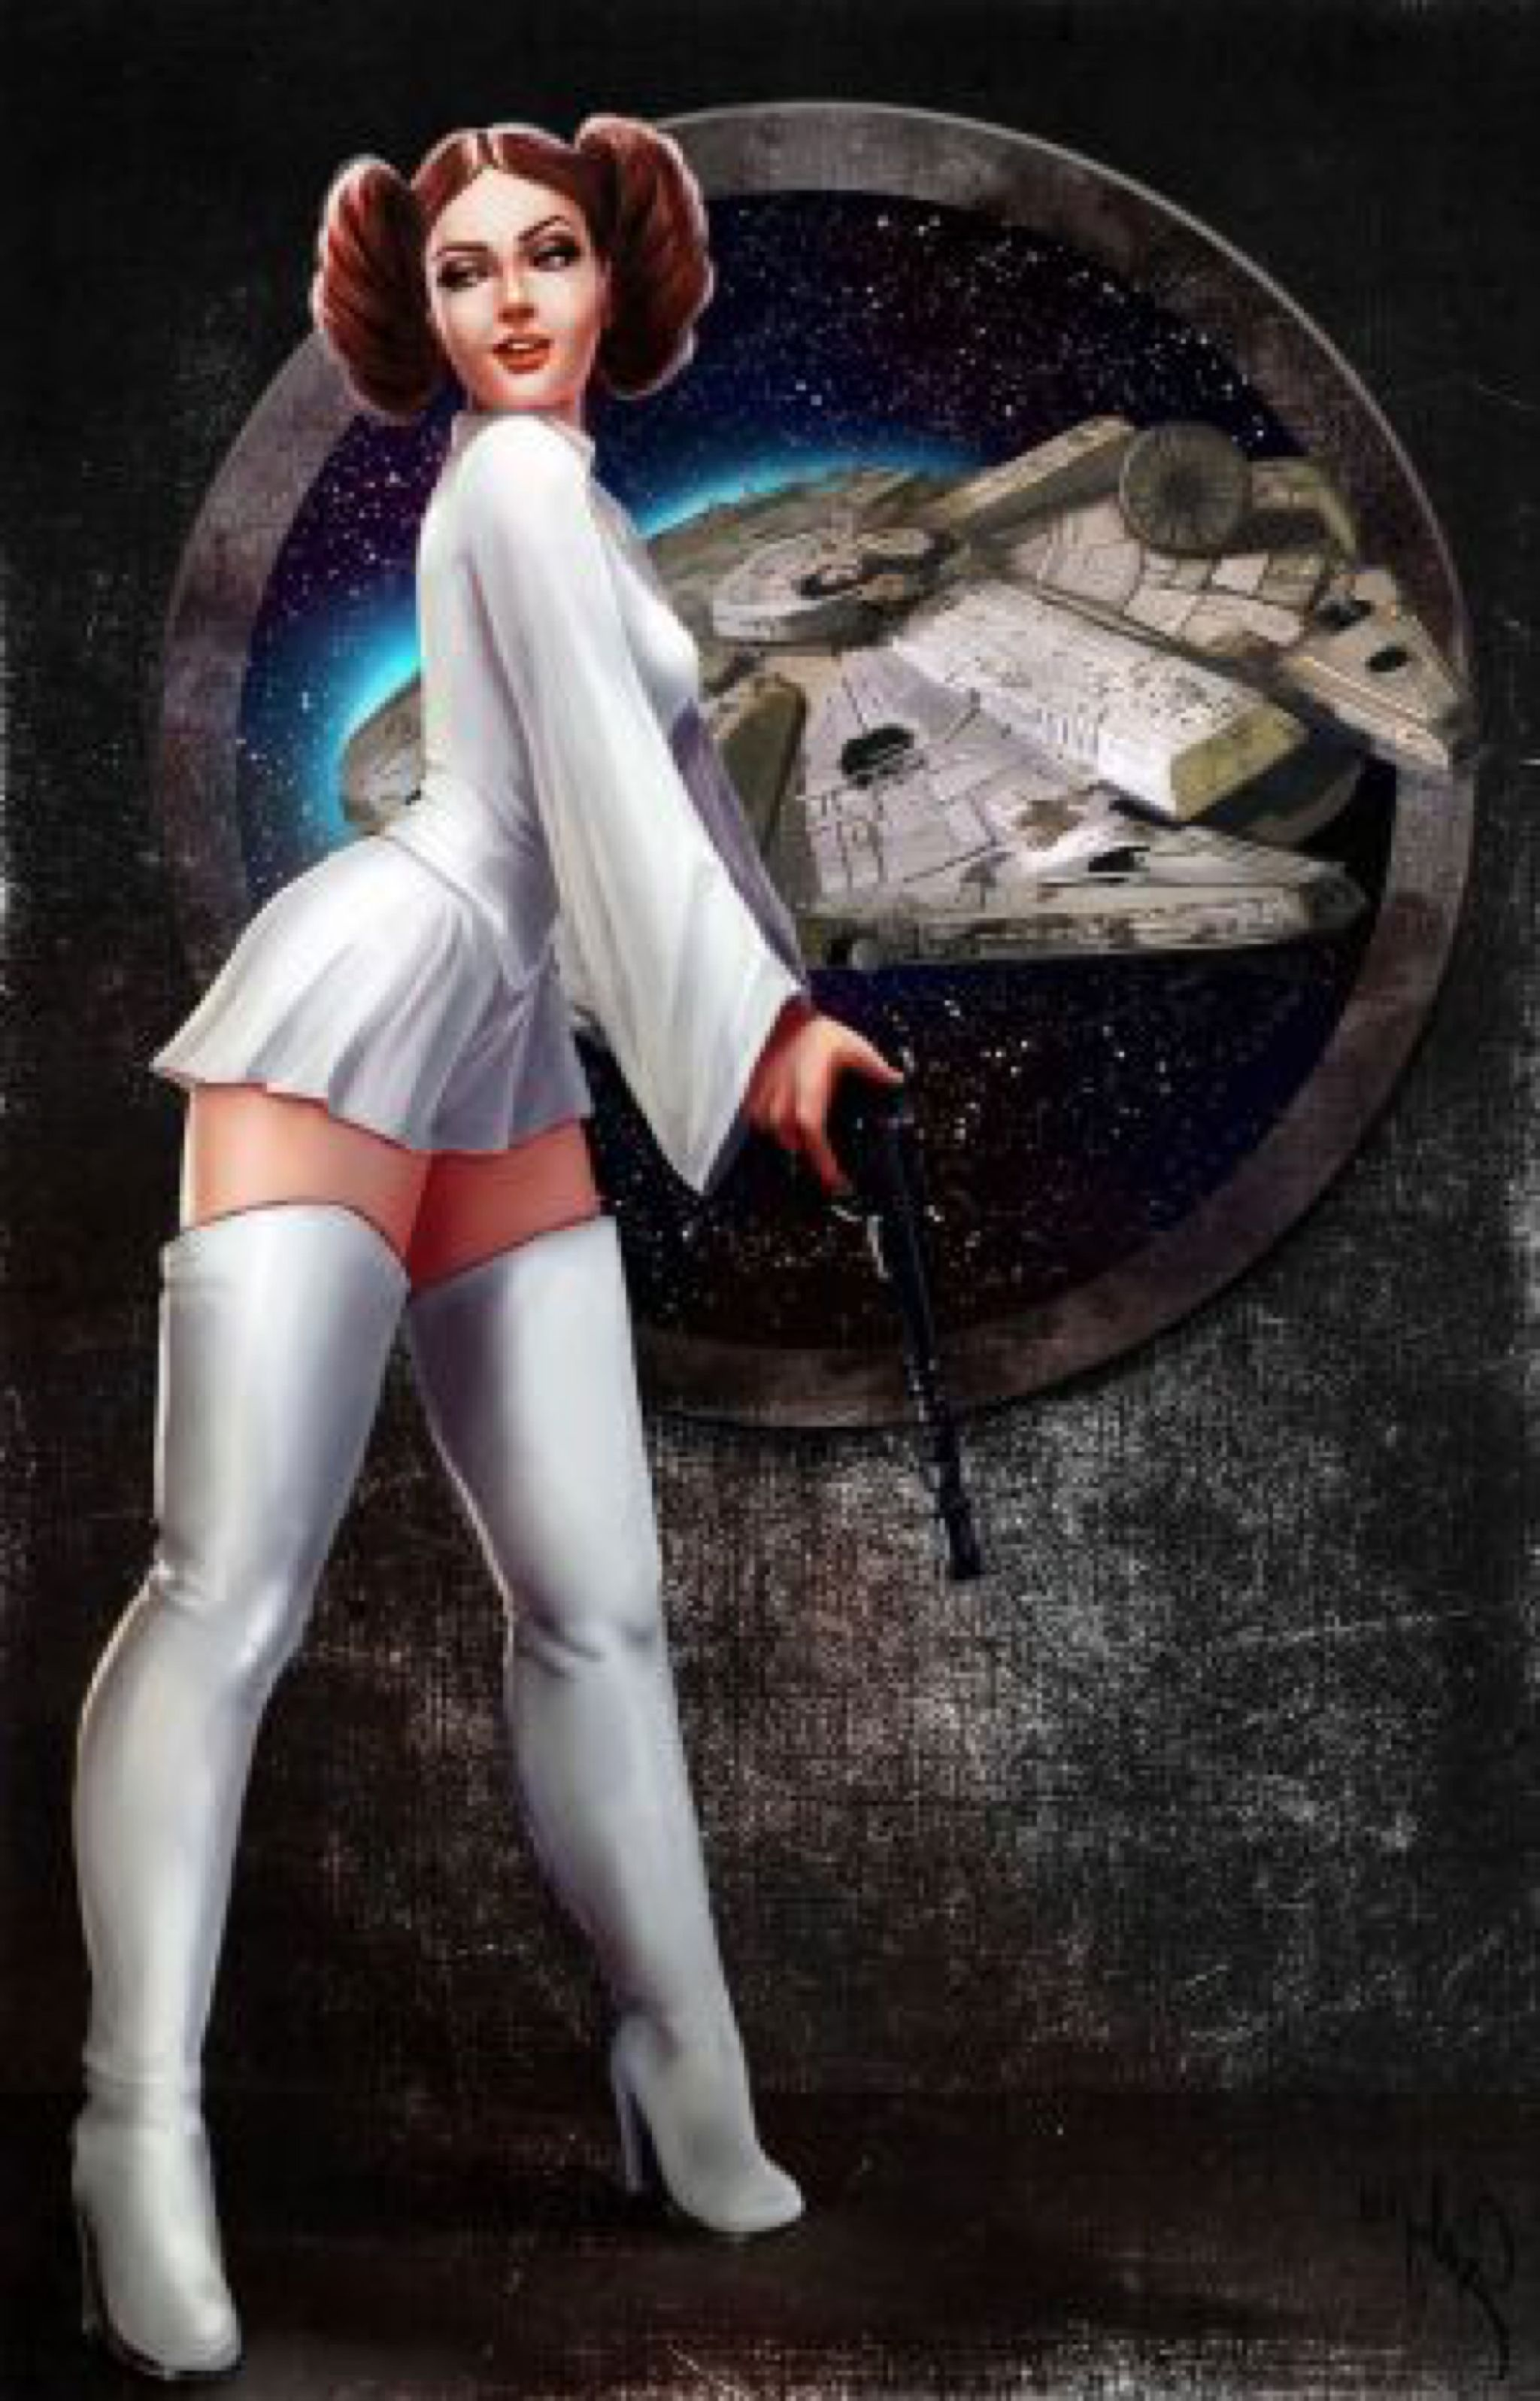 Jabba The Hutt Fucks Princess Leia Awesome leia pinupphoenixnightmare on @deviantart   star wars pics